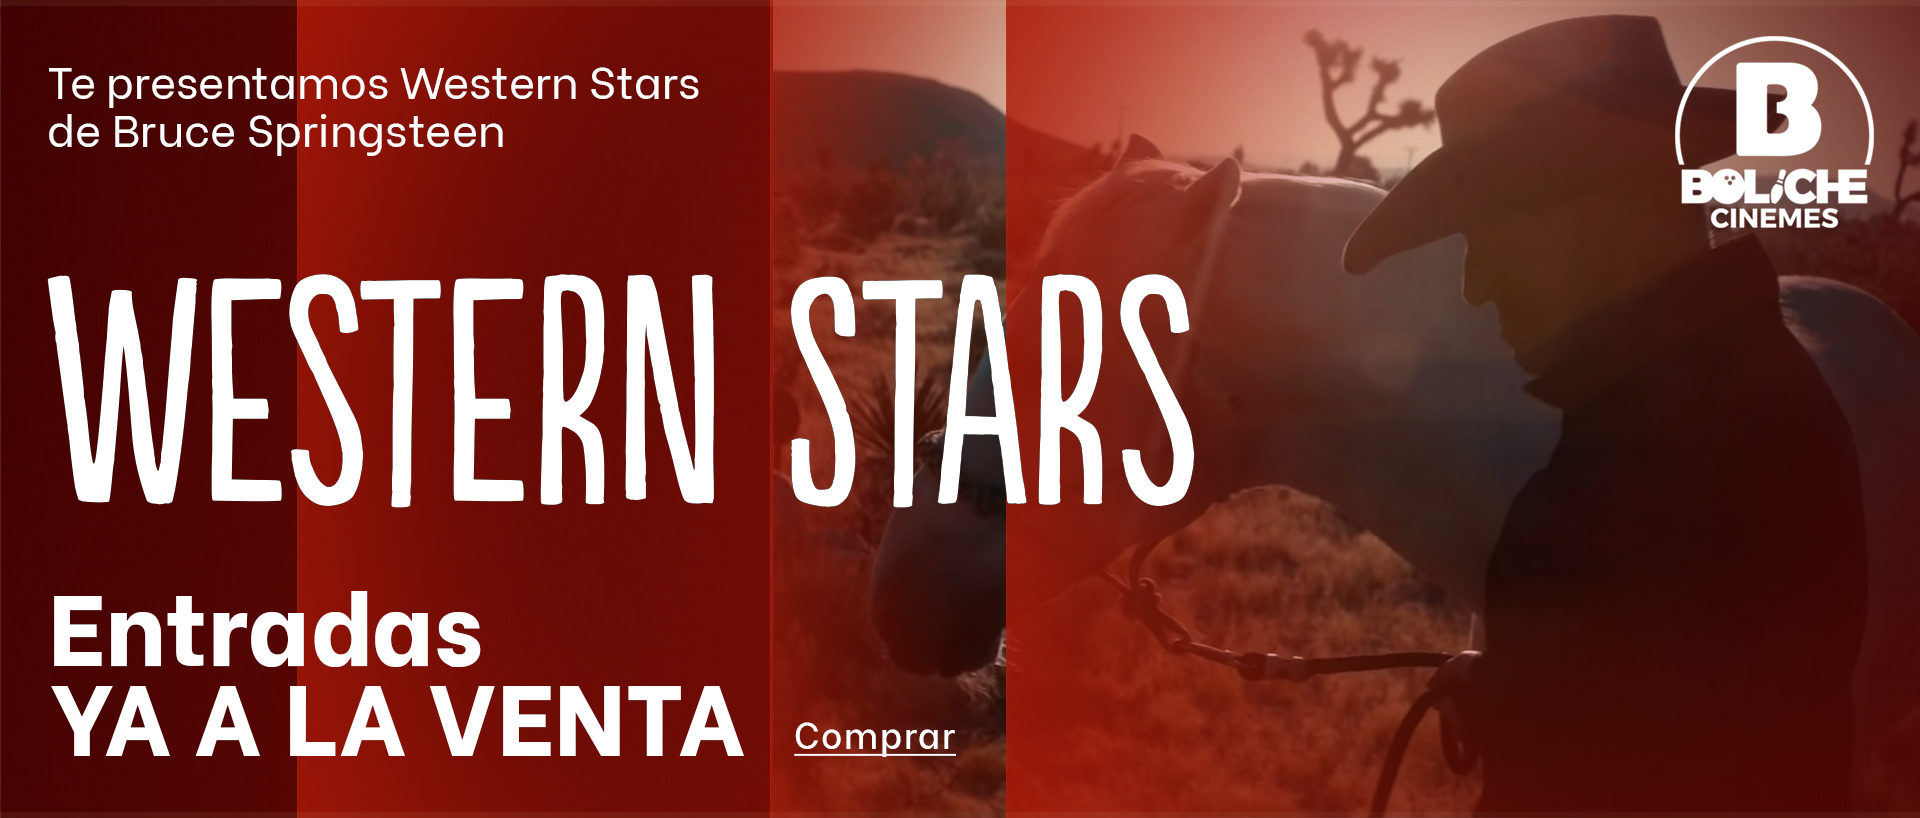 Western-Stars-promo-boliche.png